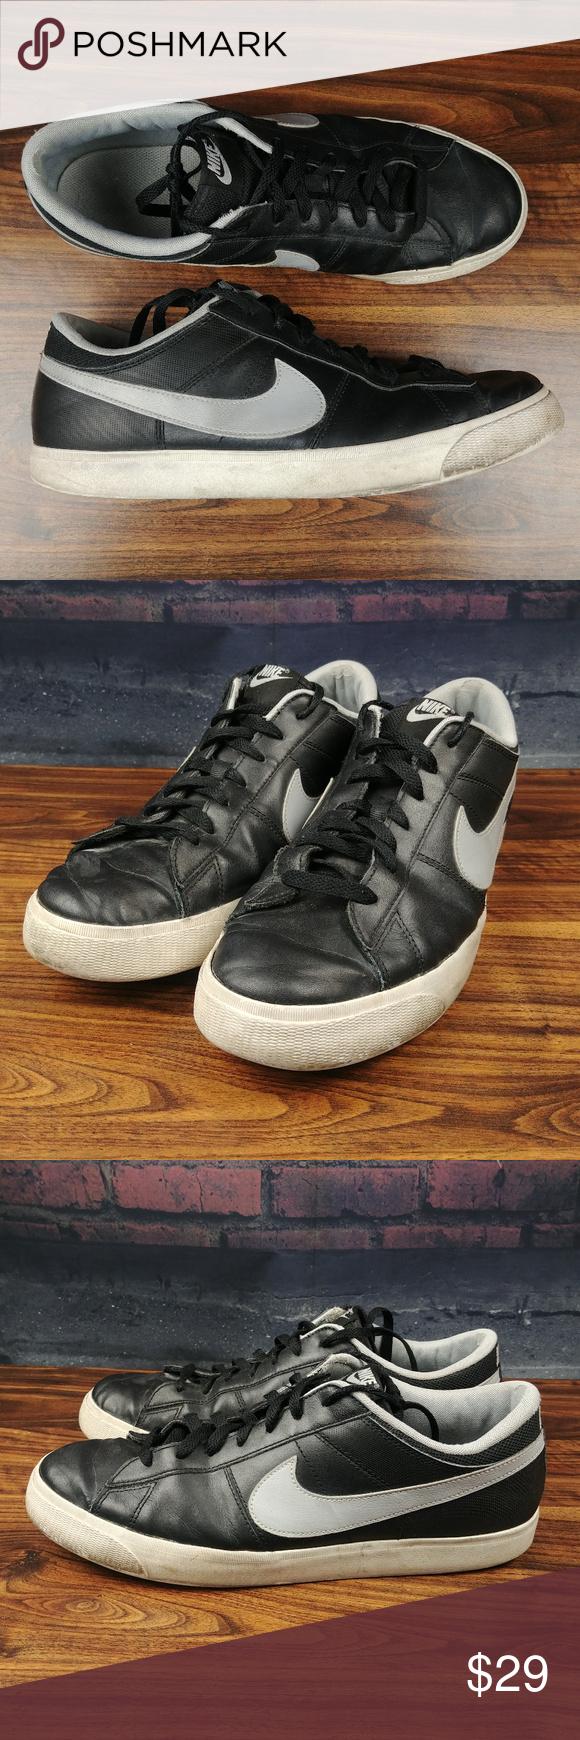 eb84b64b7abf Nike Match Supreme Leather Shoe Sneakers Mens 13 Nike Match Supreme Leather  Shoe Sneakers Mens 13